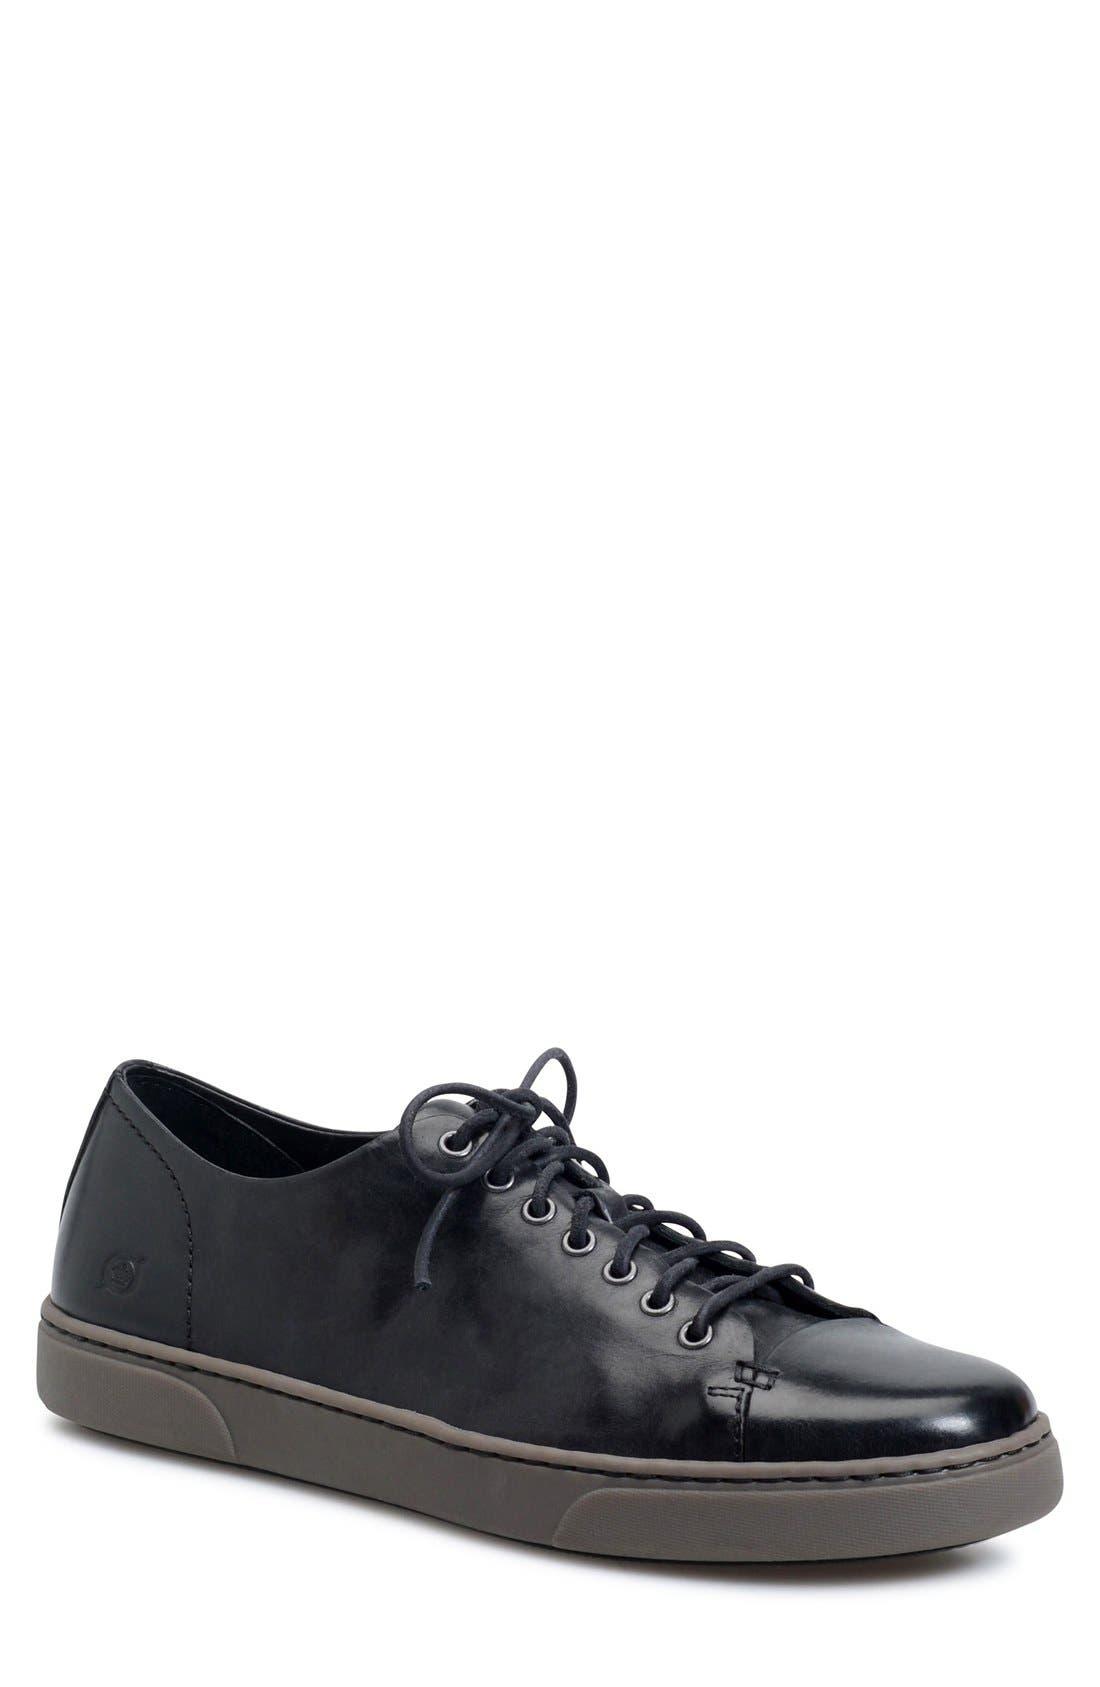 'Bayne' Cap Toe Sneaker,                             Main thumbnail 1, color,                             001